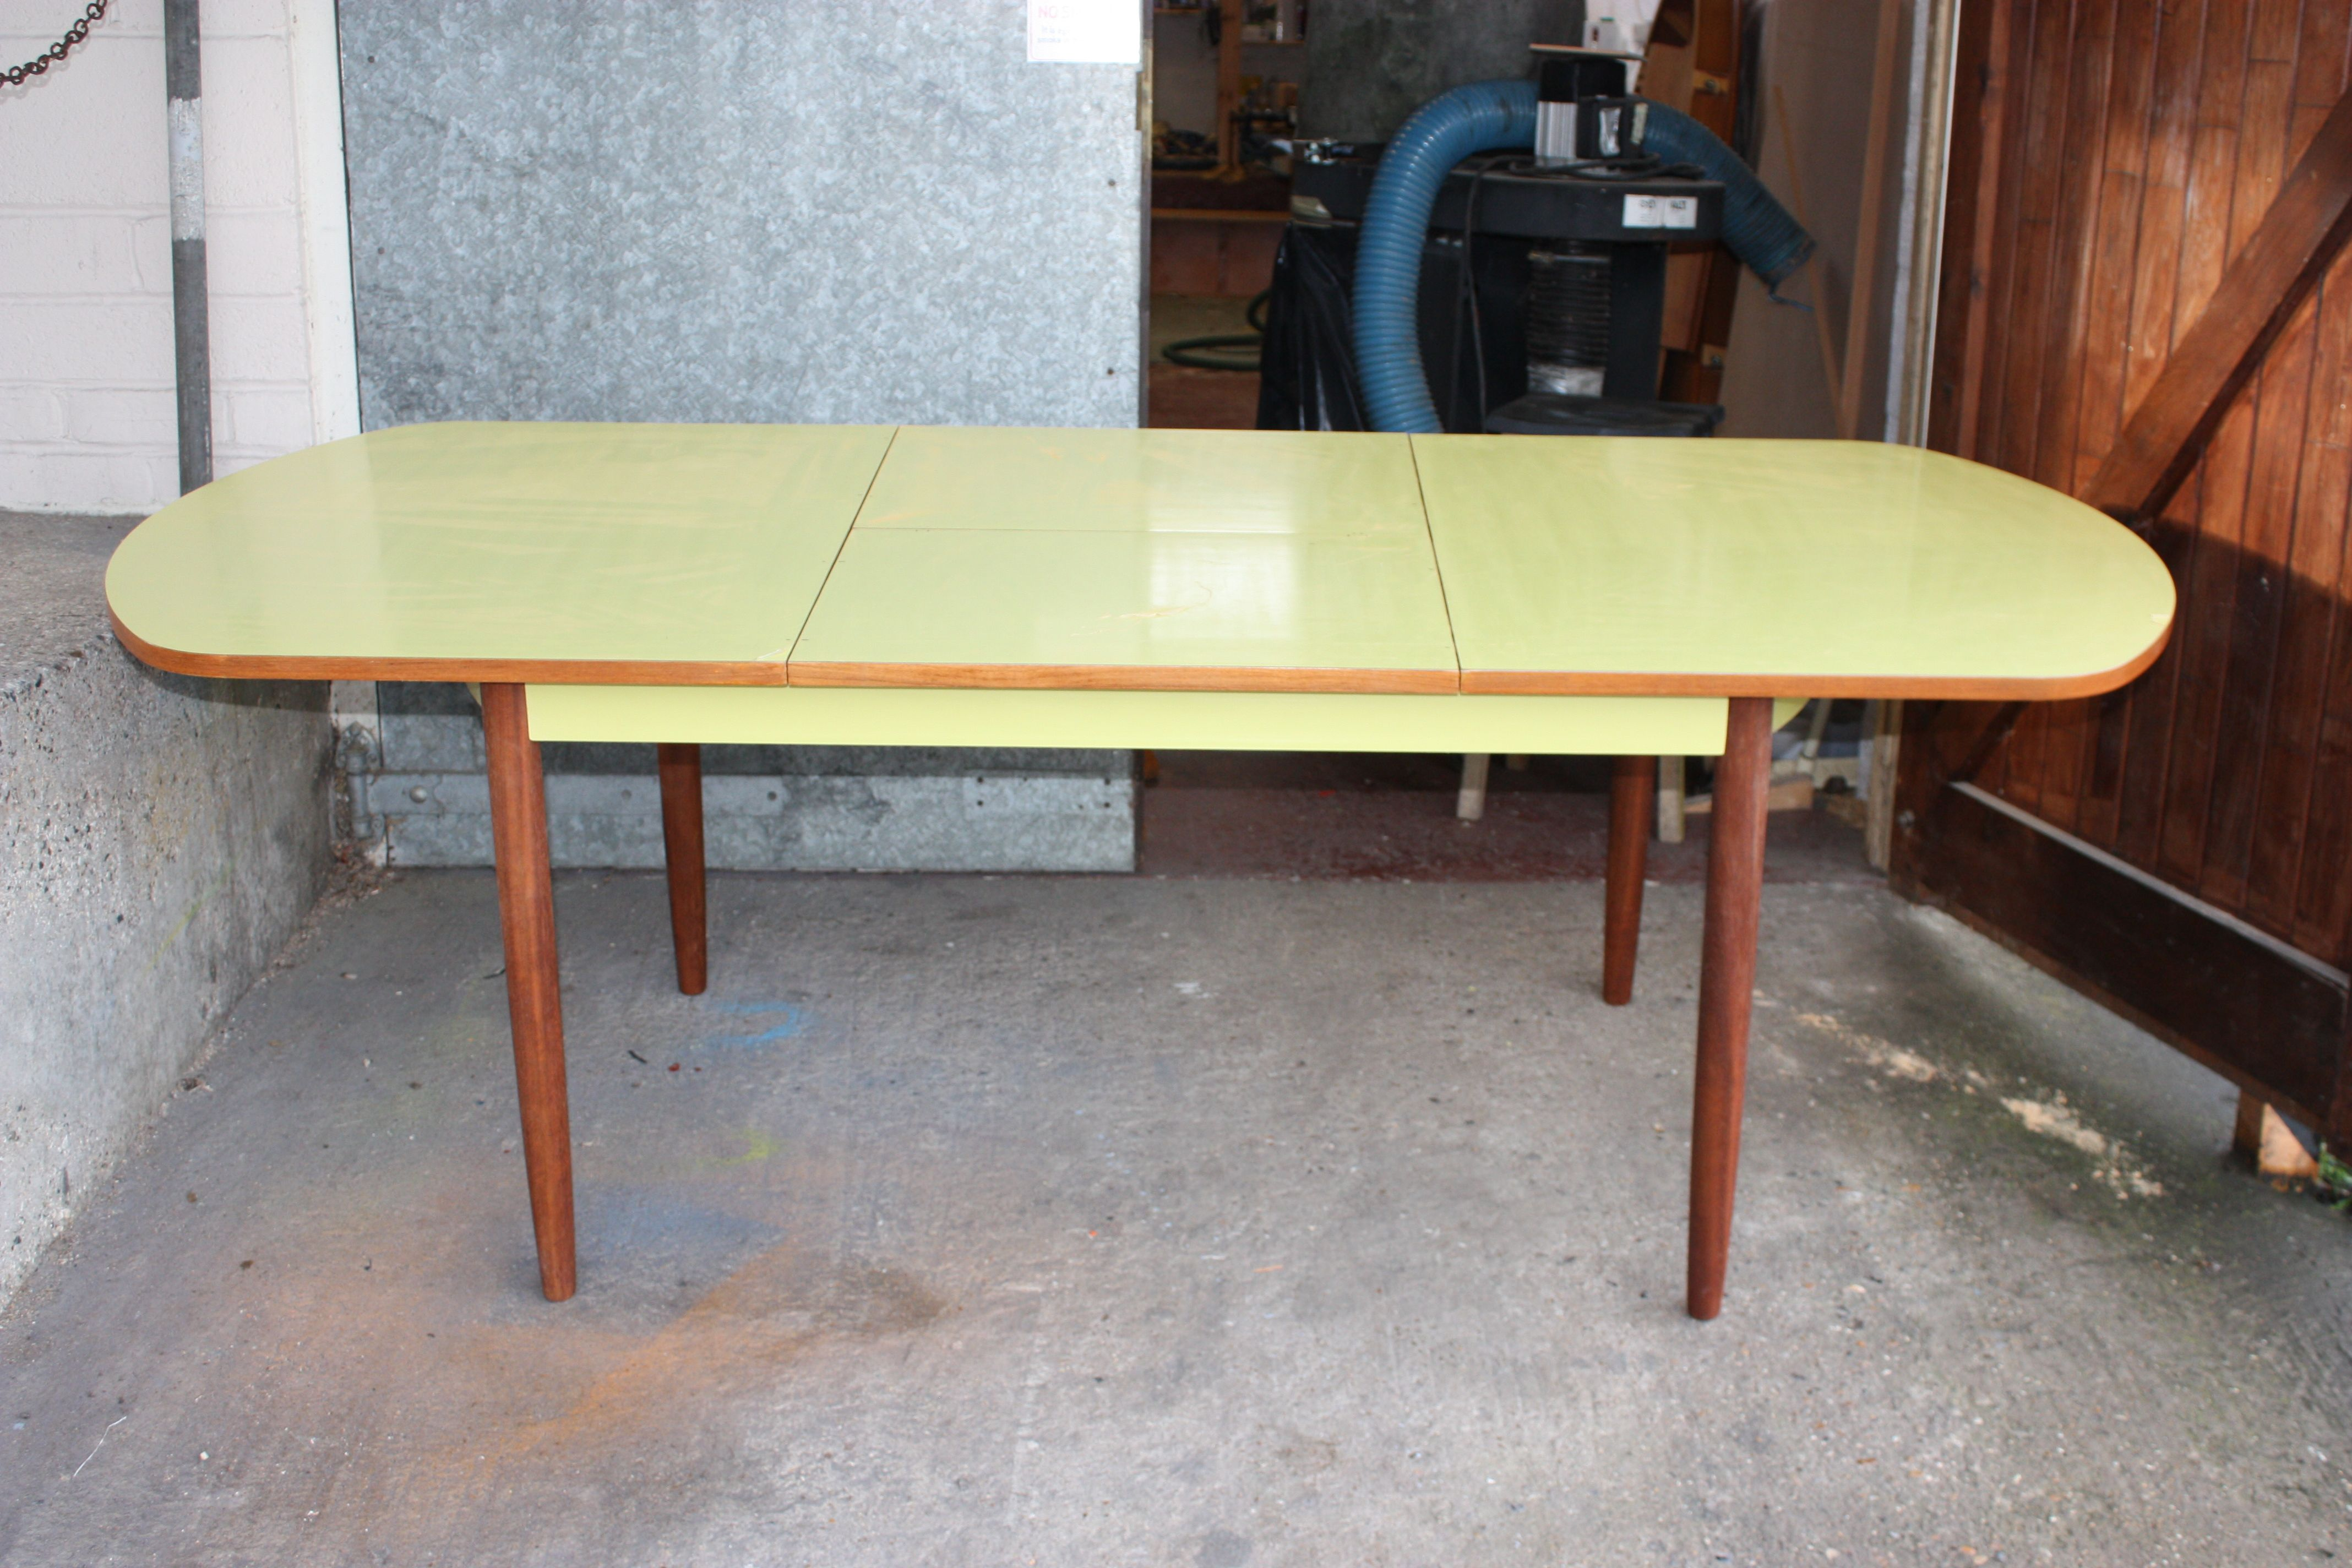 Green Table 0051 Jpg 4272 2848 G Plan Furniture Dining Table